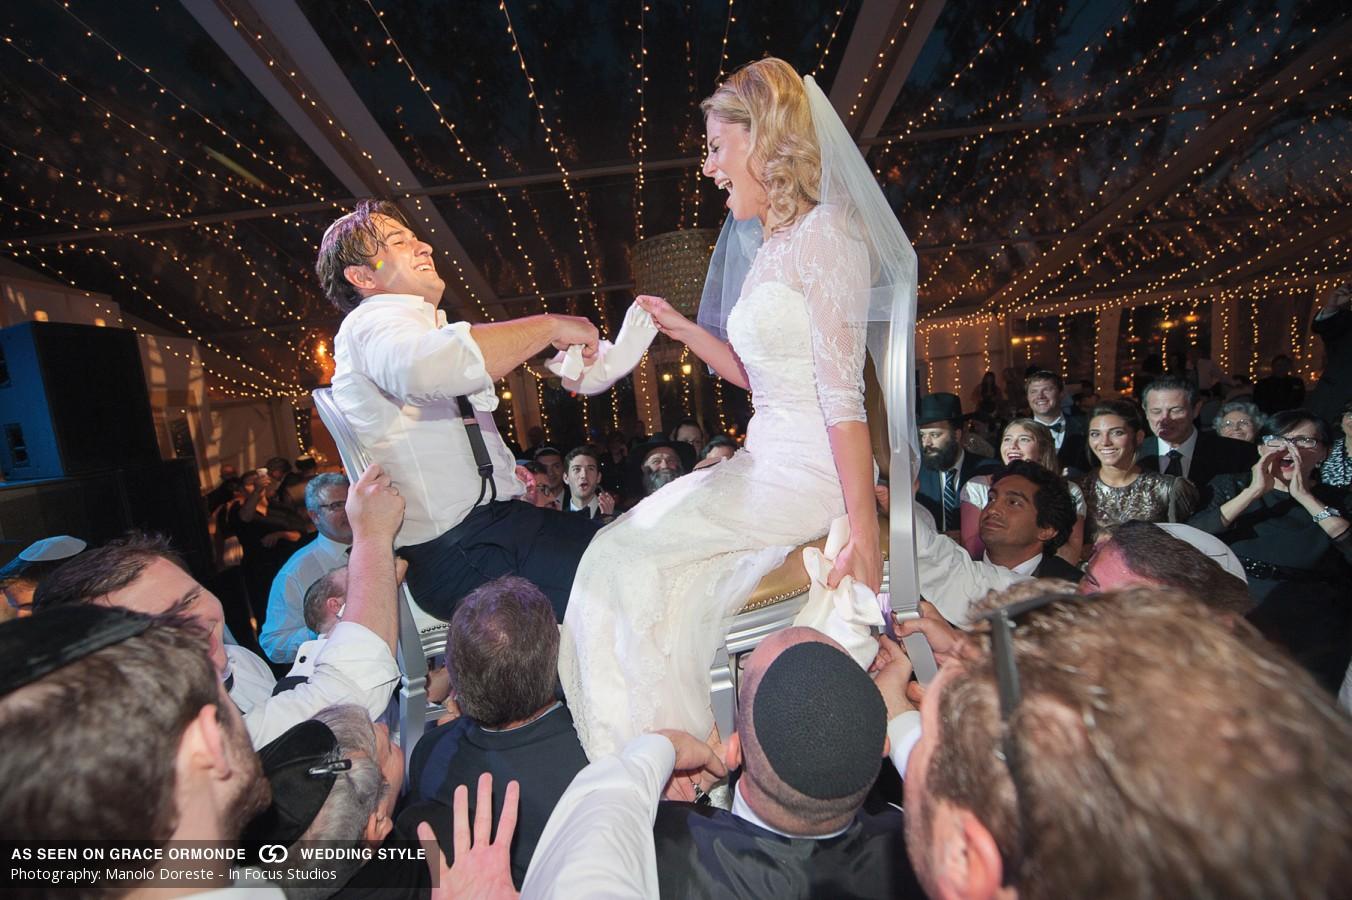 manolo-doreste-wedding-ss14-009.jpg